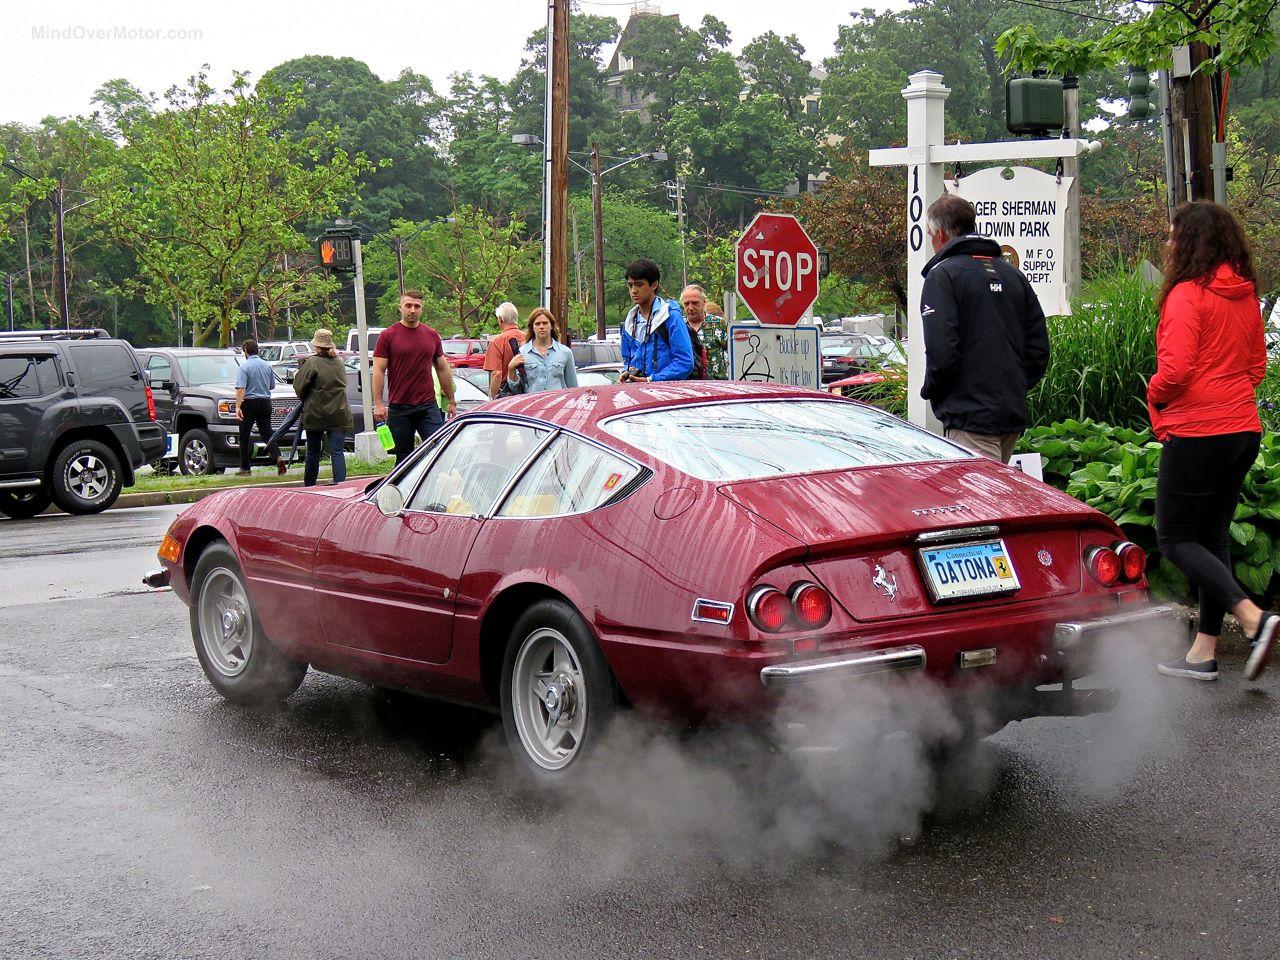 Ferrari 365 GTB4 Daytona Greenwich CT